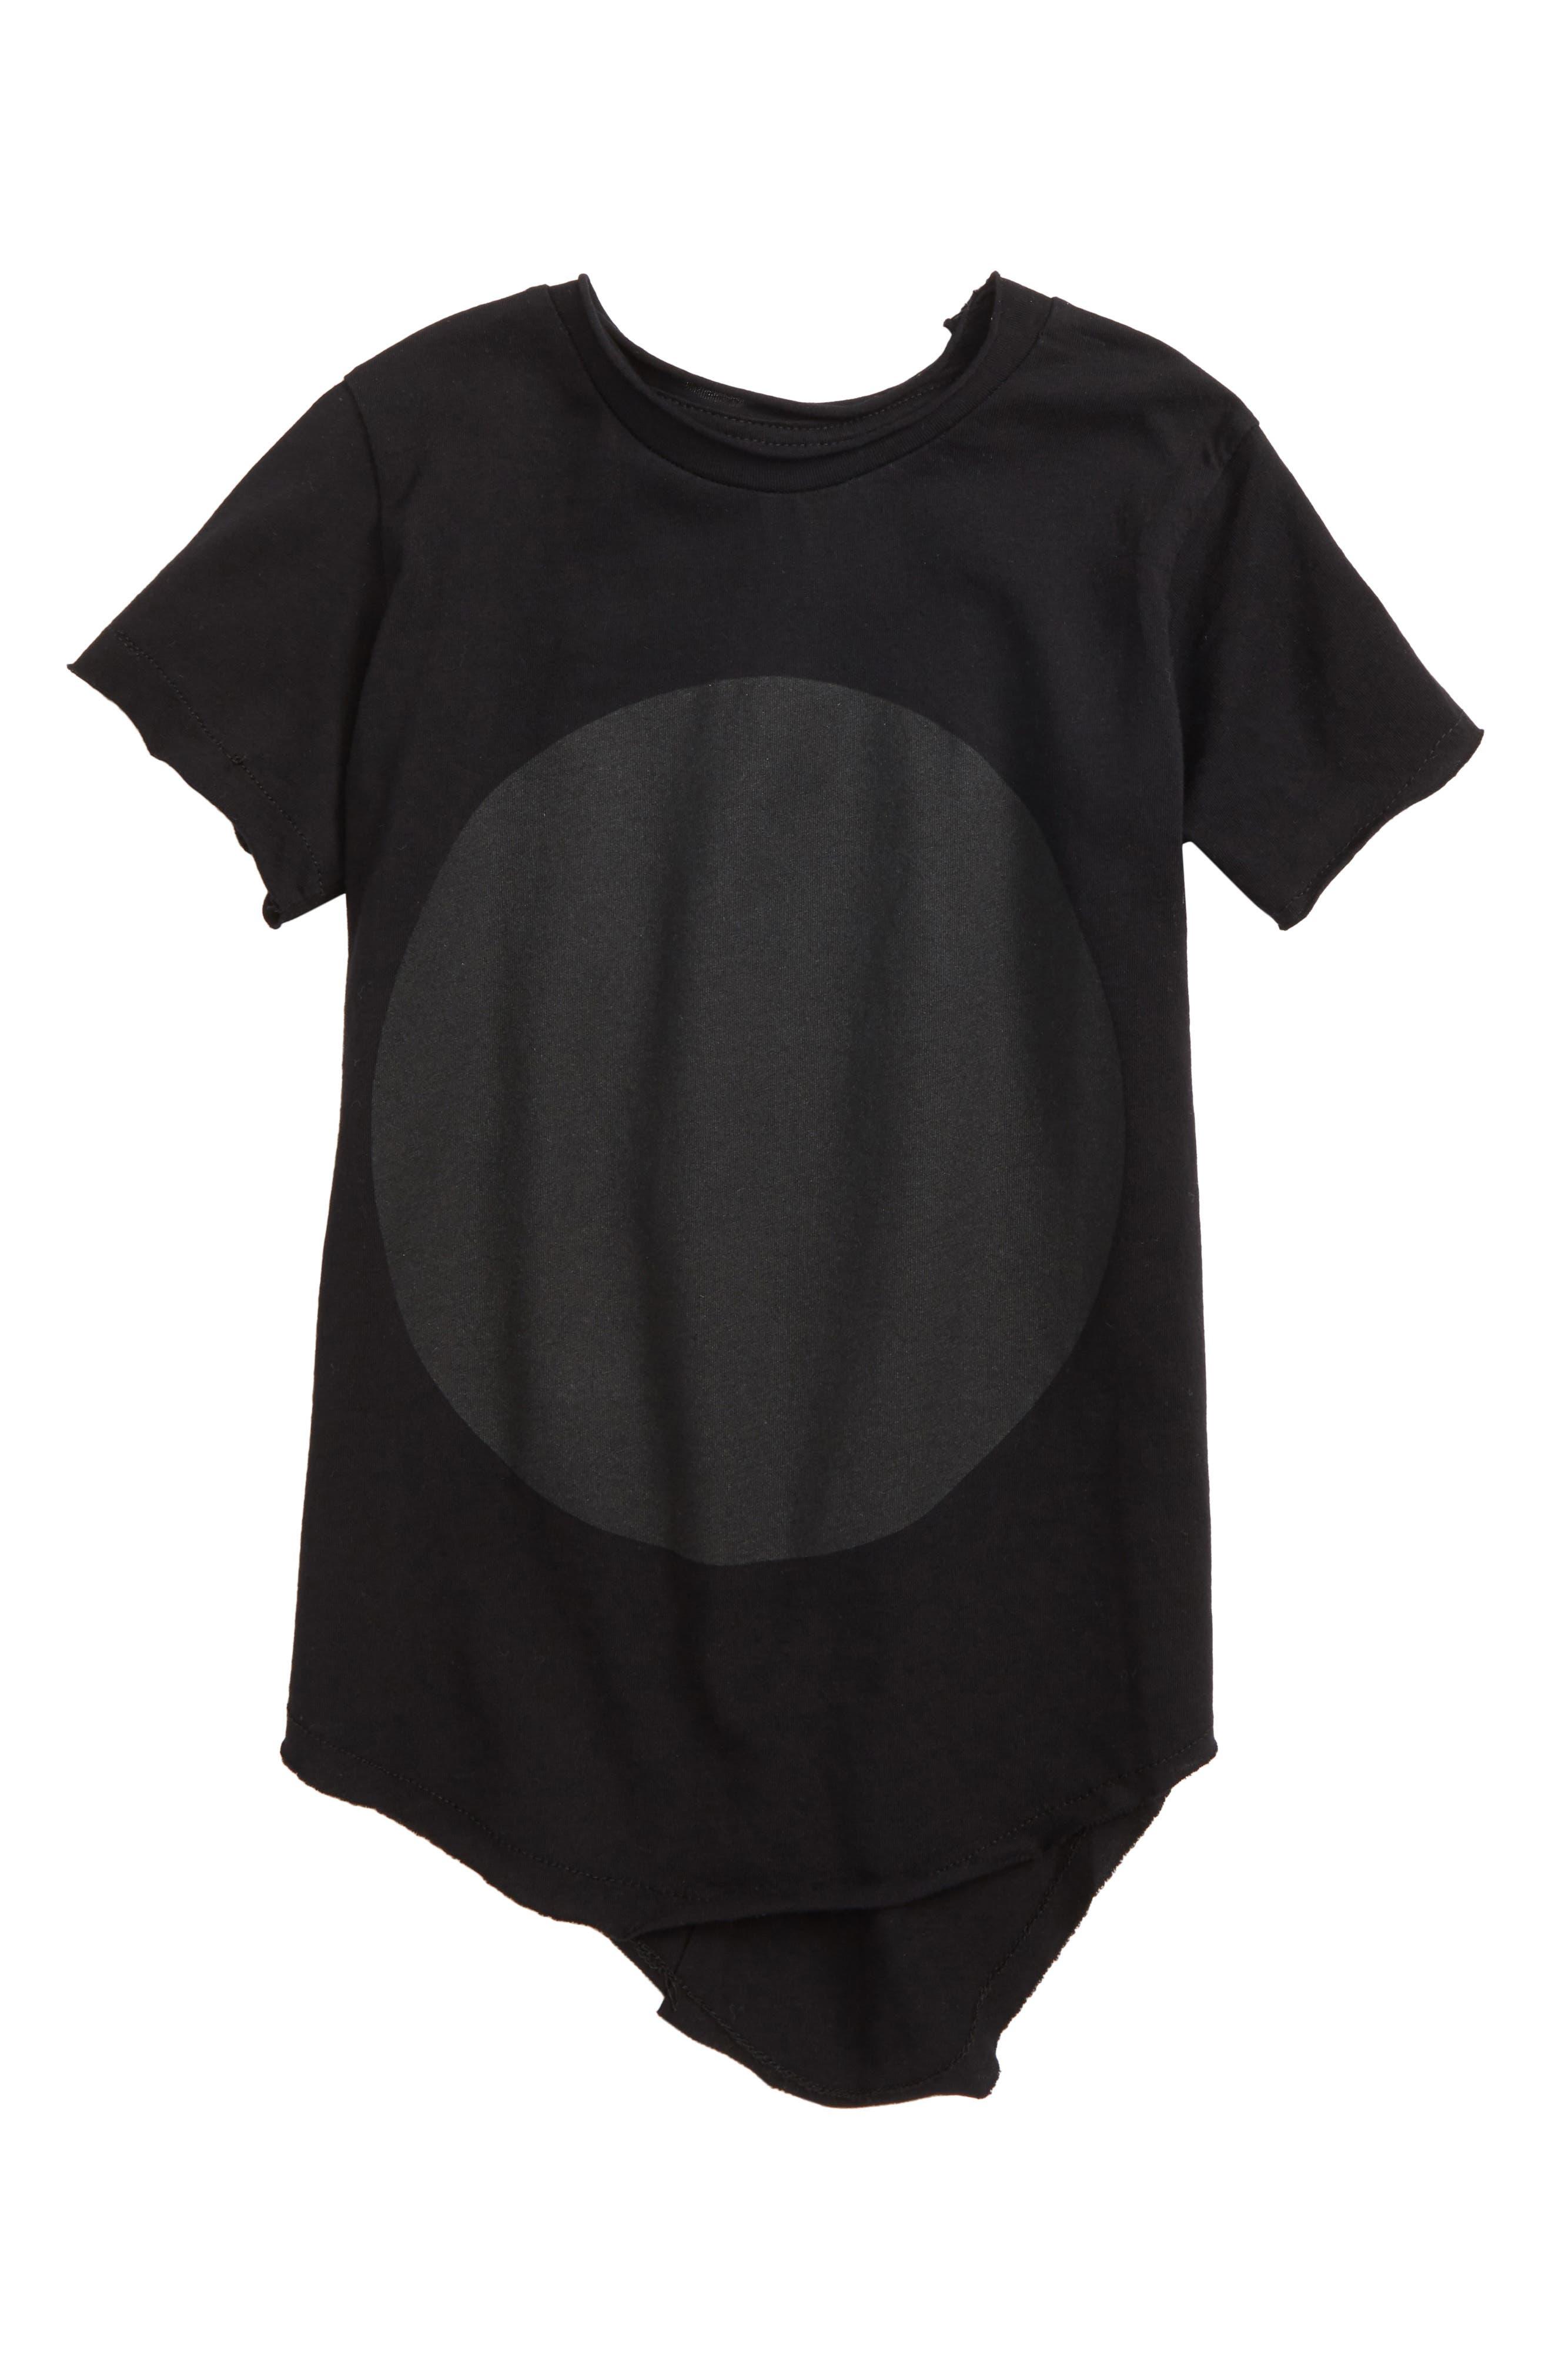 Nununu Circle Graphic Shirt (Baby)